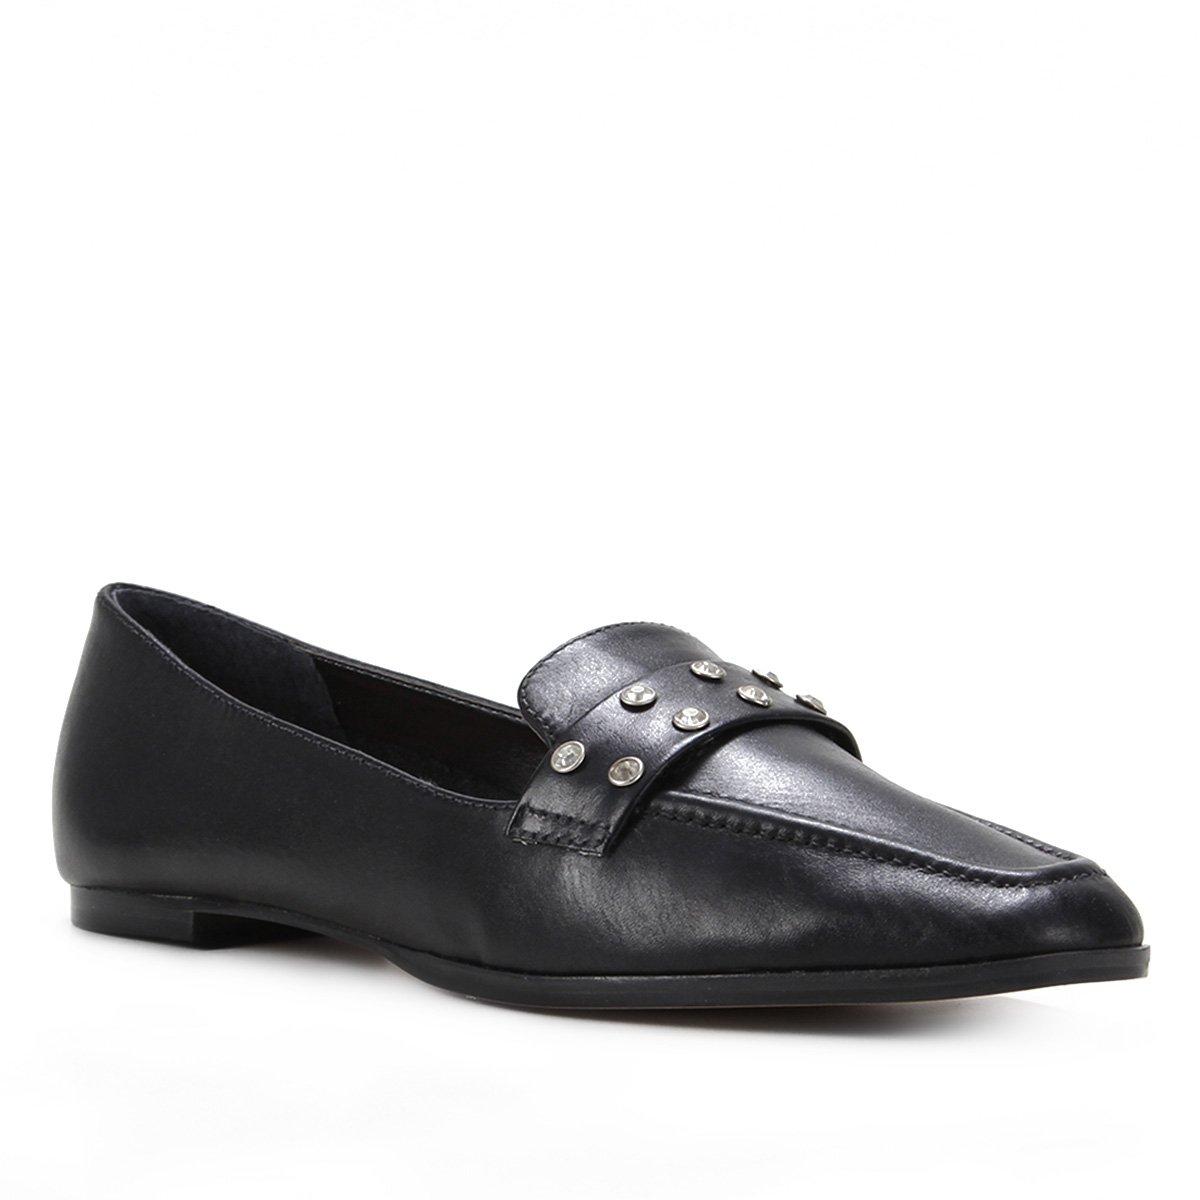 Mocassim Couro Shoestock Gravata Strass Feminino